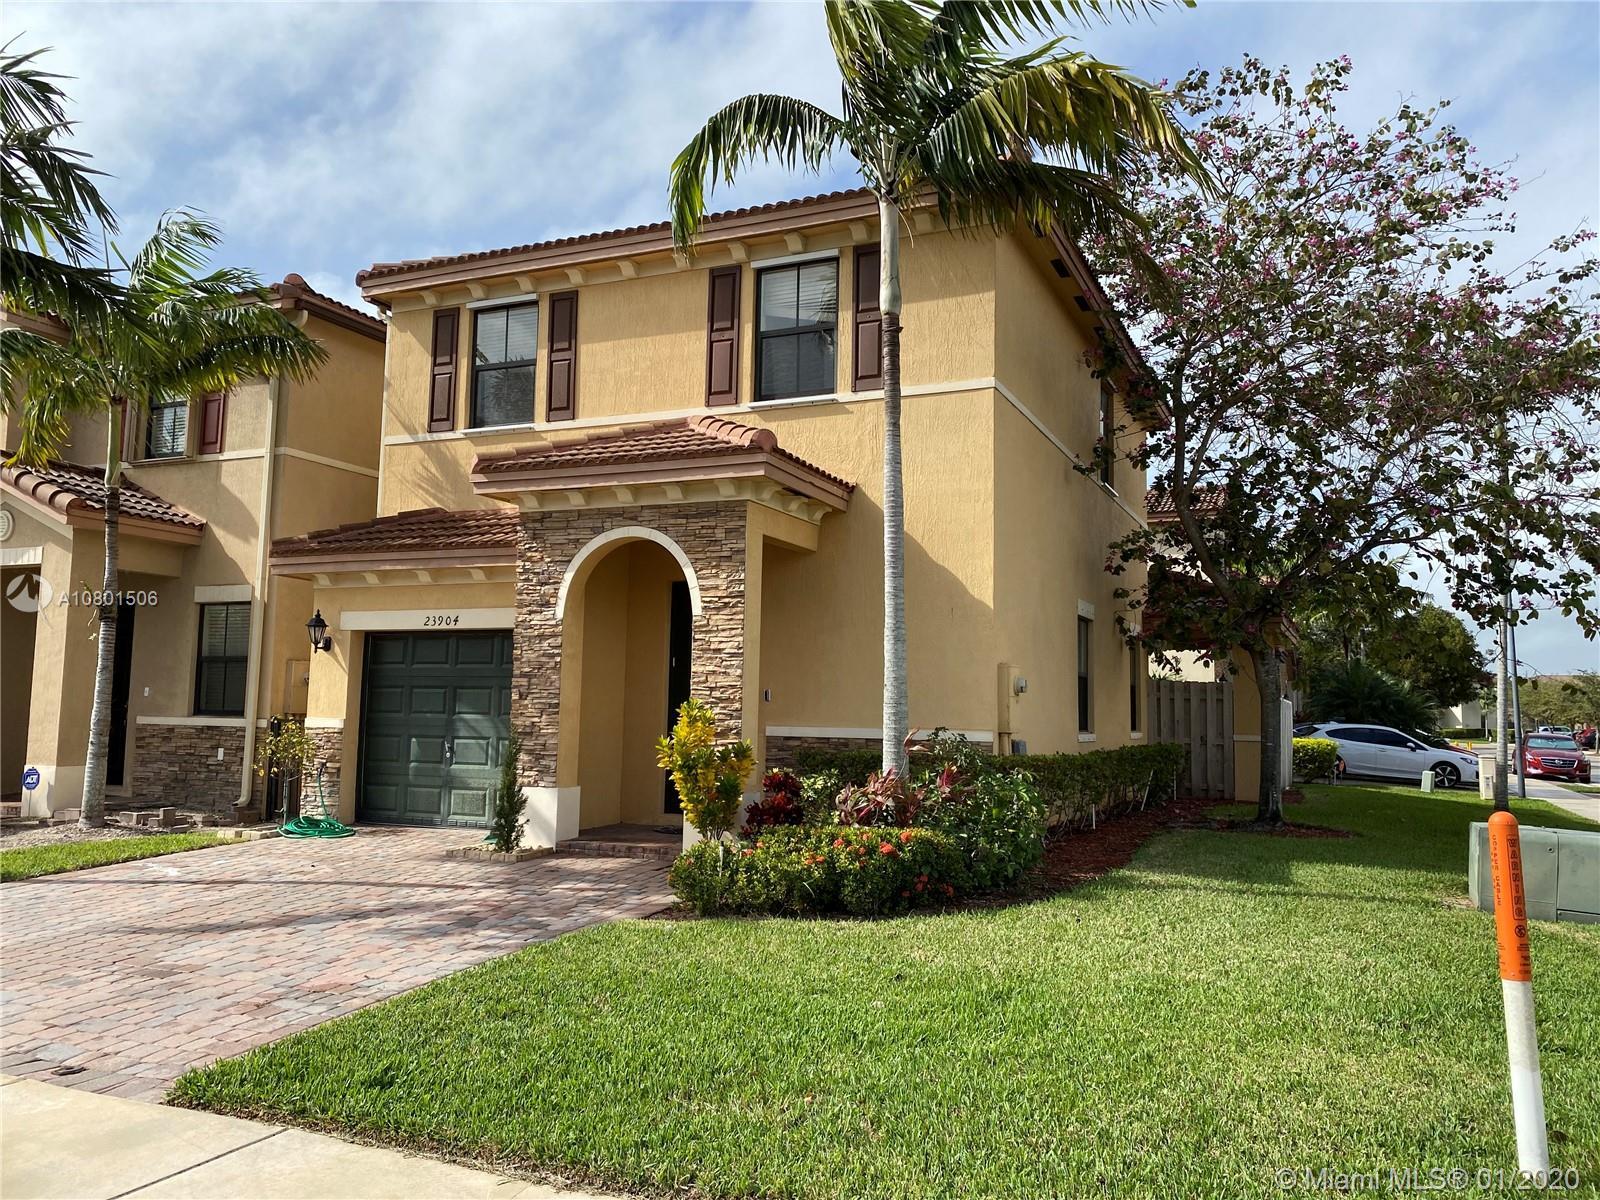 23904 SW 113th Ave, Homestead, FL 33032 - Homestead, FL real estate listing